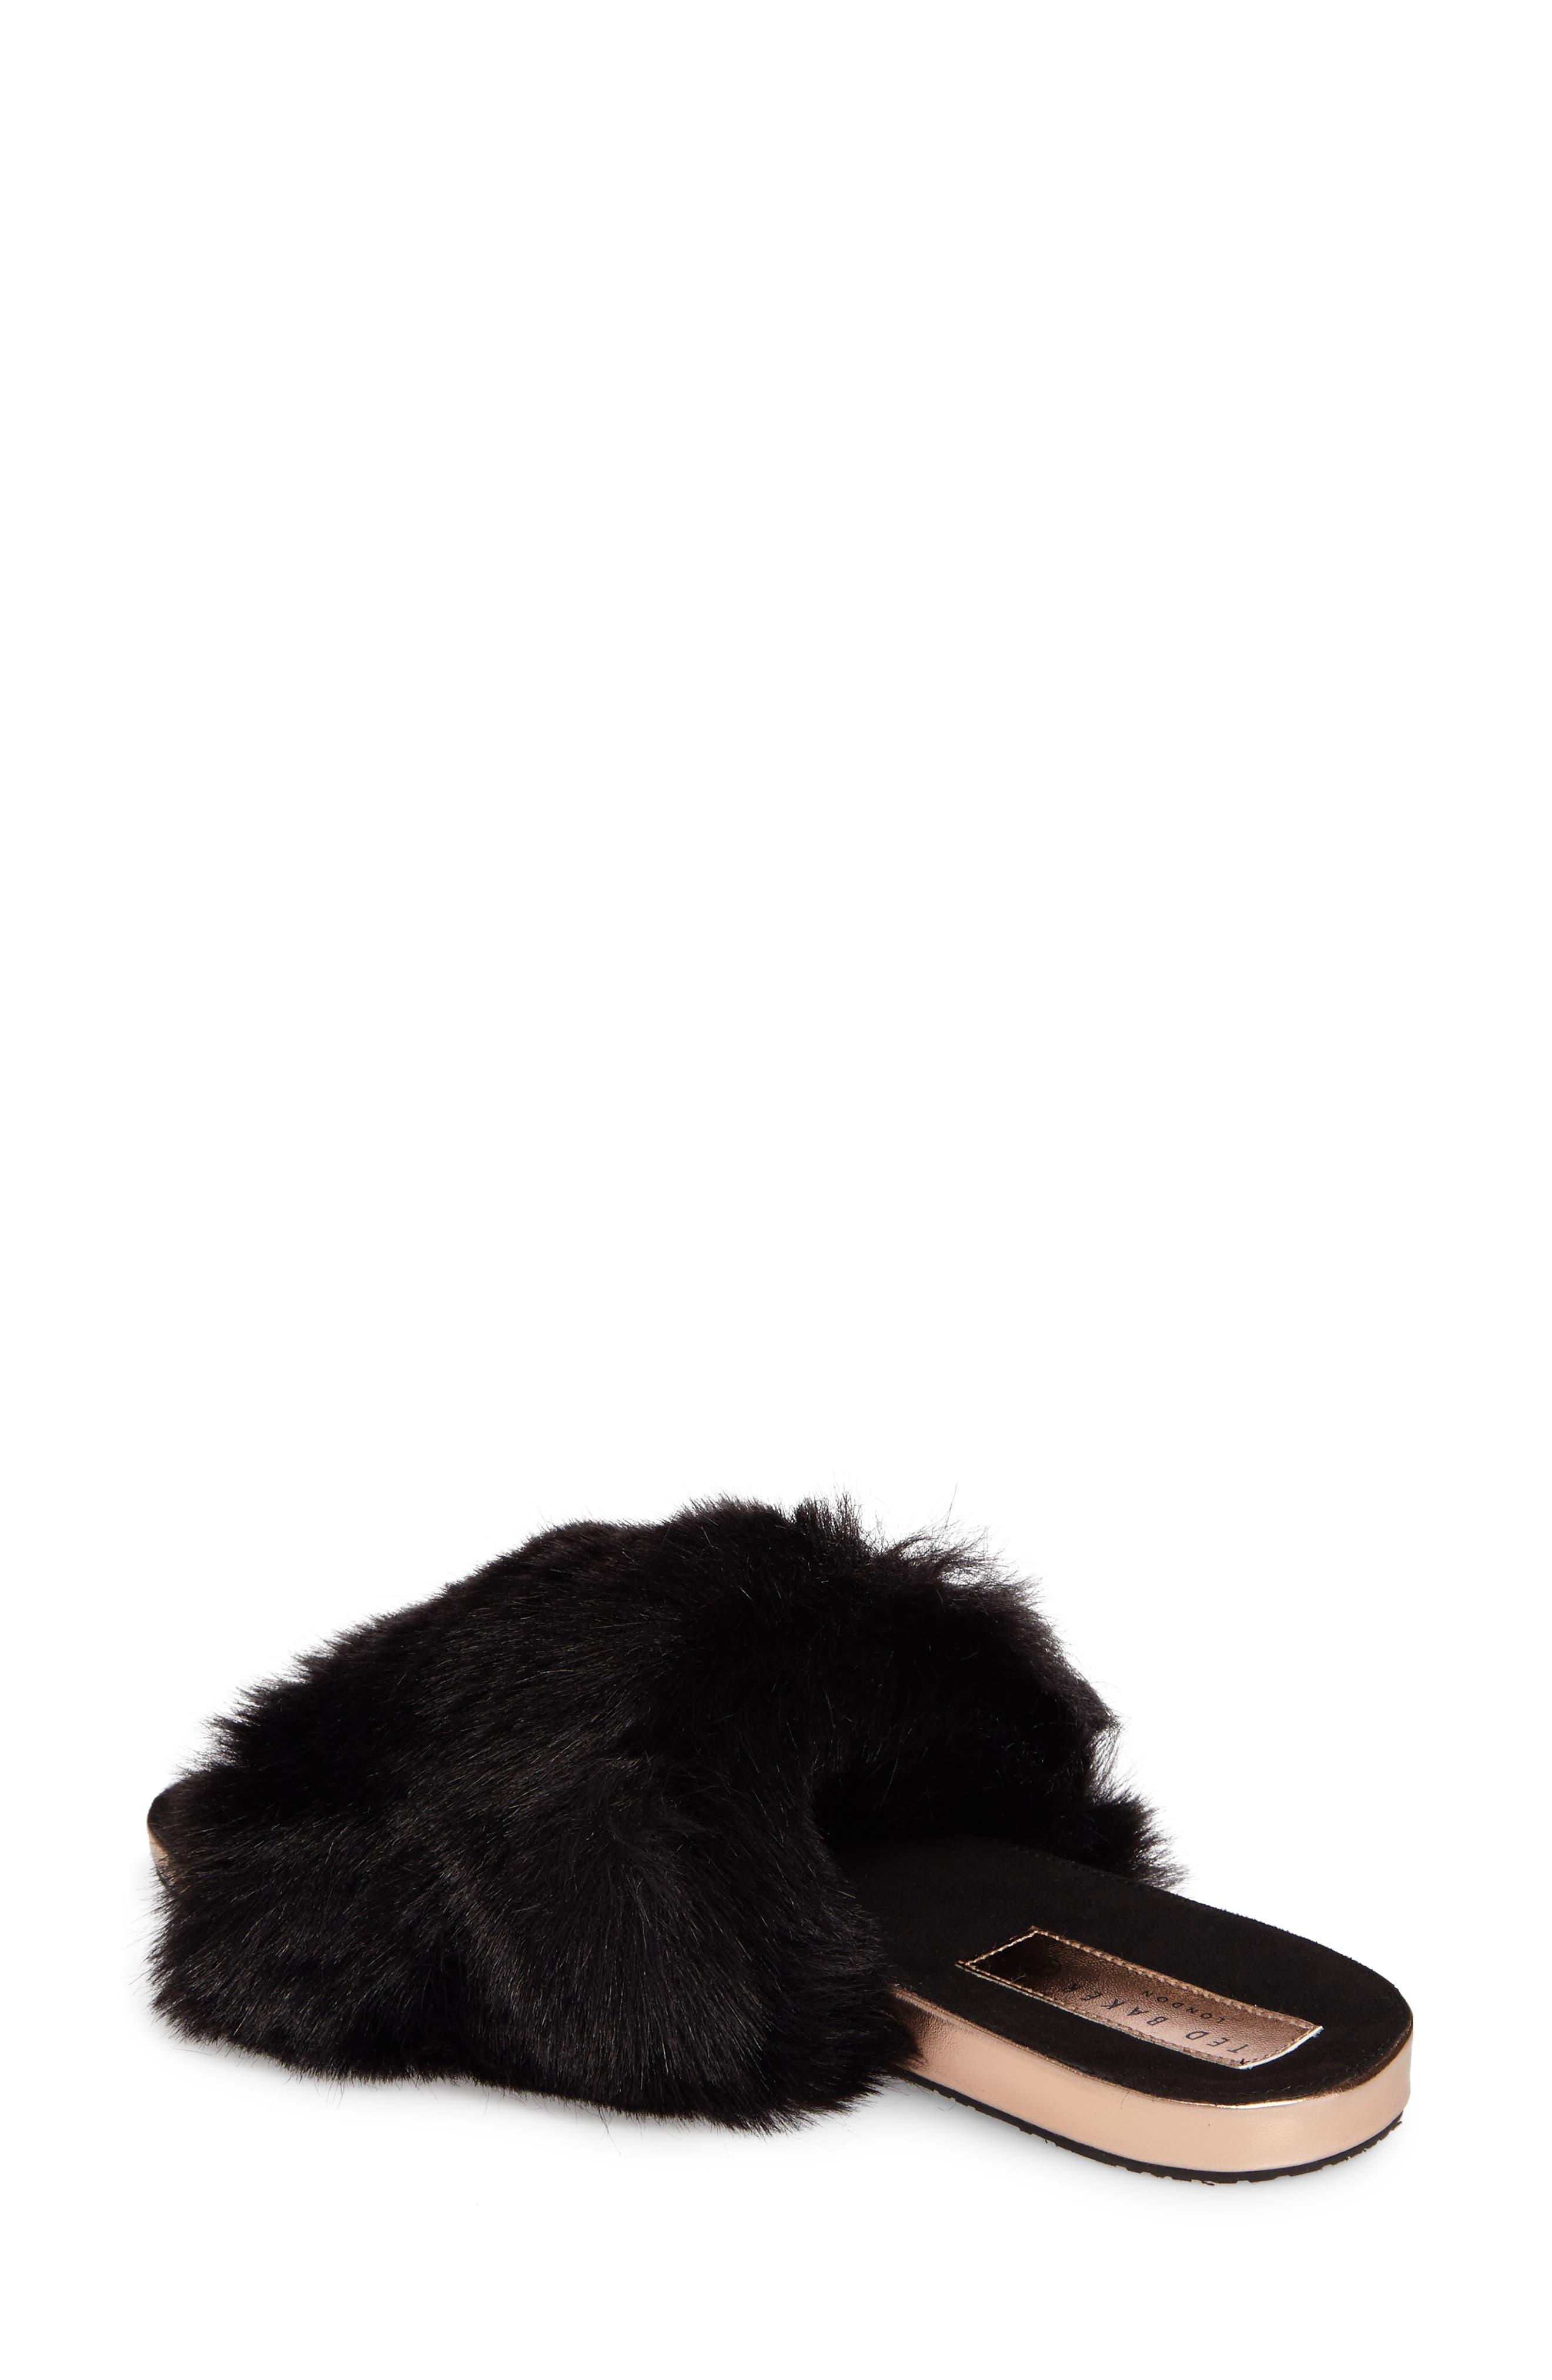 Pancey Faux Fur Slipper,                             Alternate thumbnail 2, color,                             001